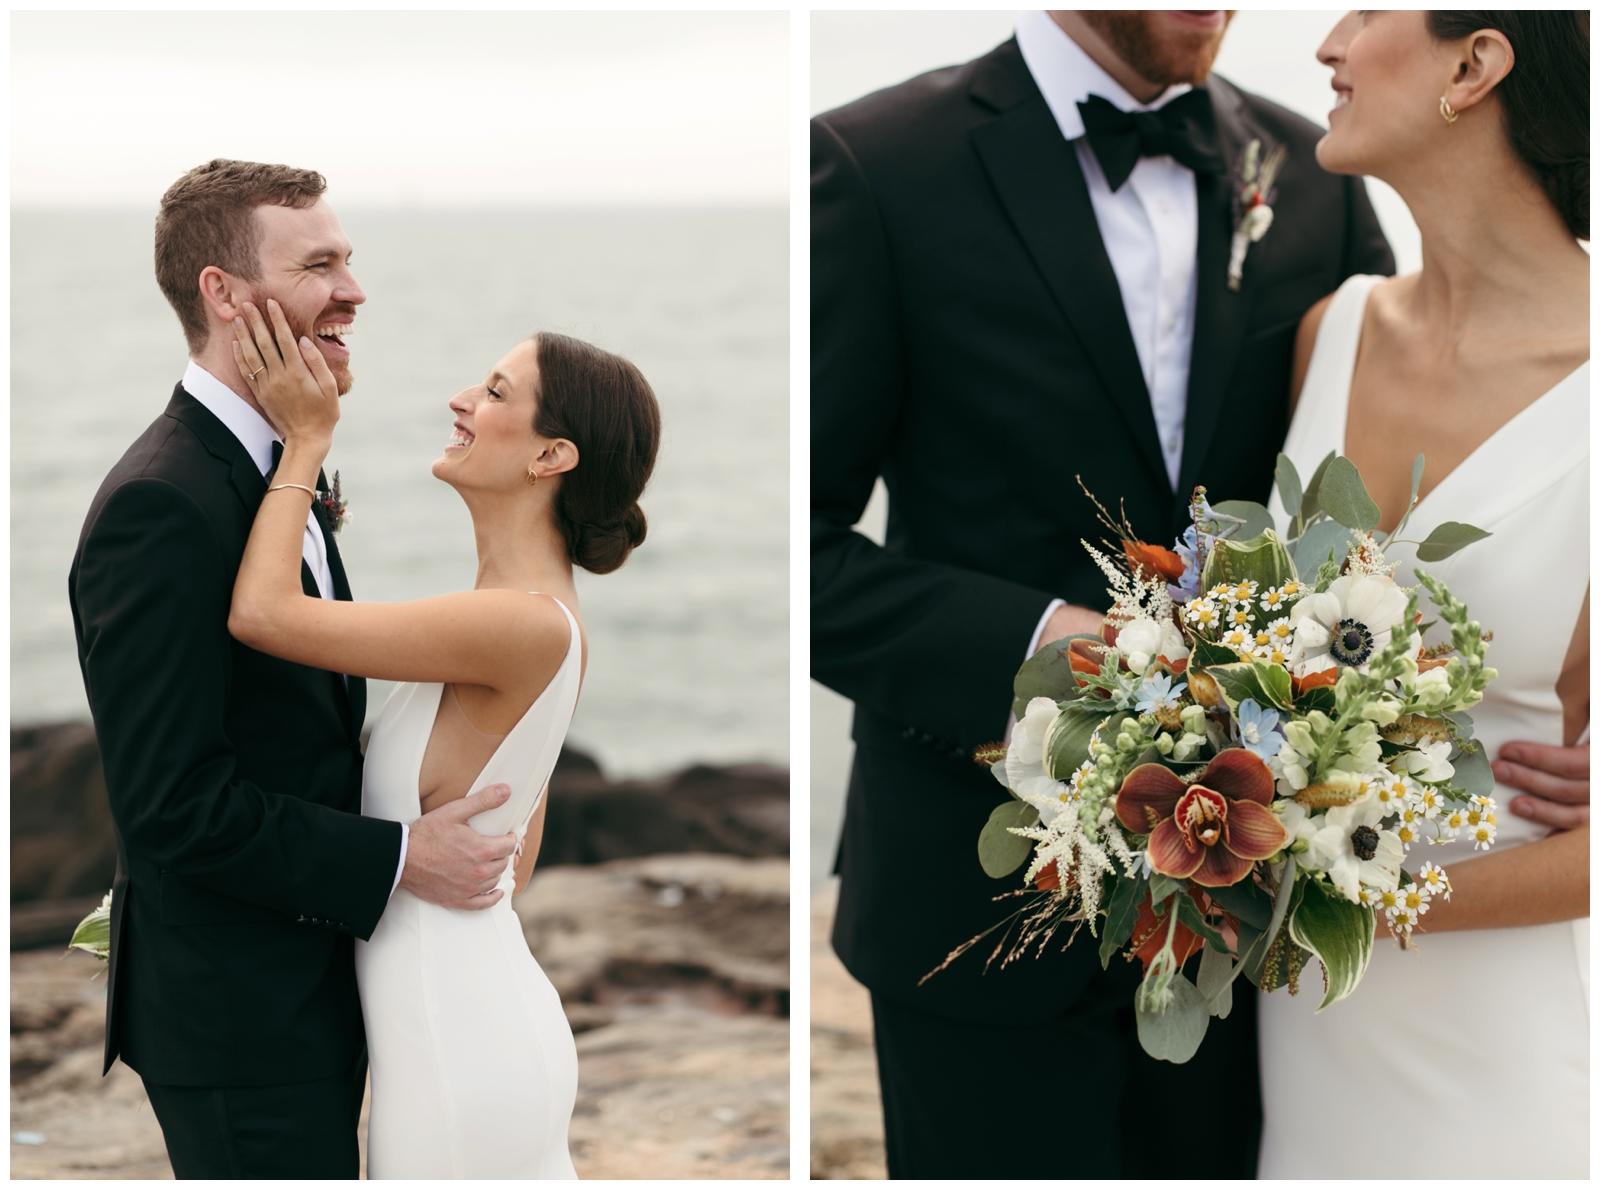 Madison-Beach-Hotel-Wedding-Bailey-Q-Photo-Boston-Wedding-Photographer-012.jpg